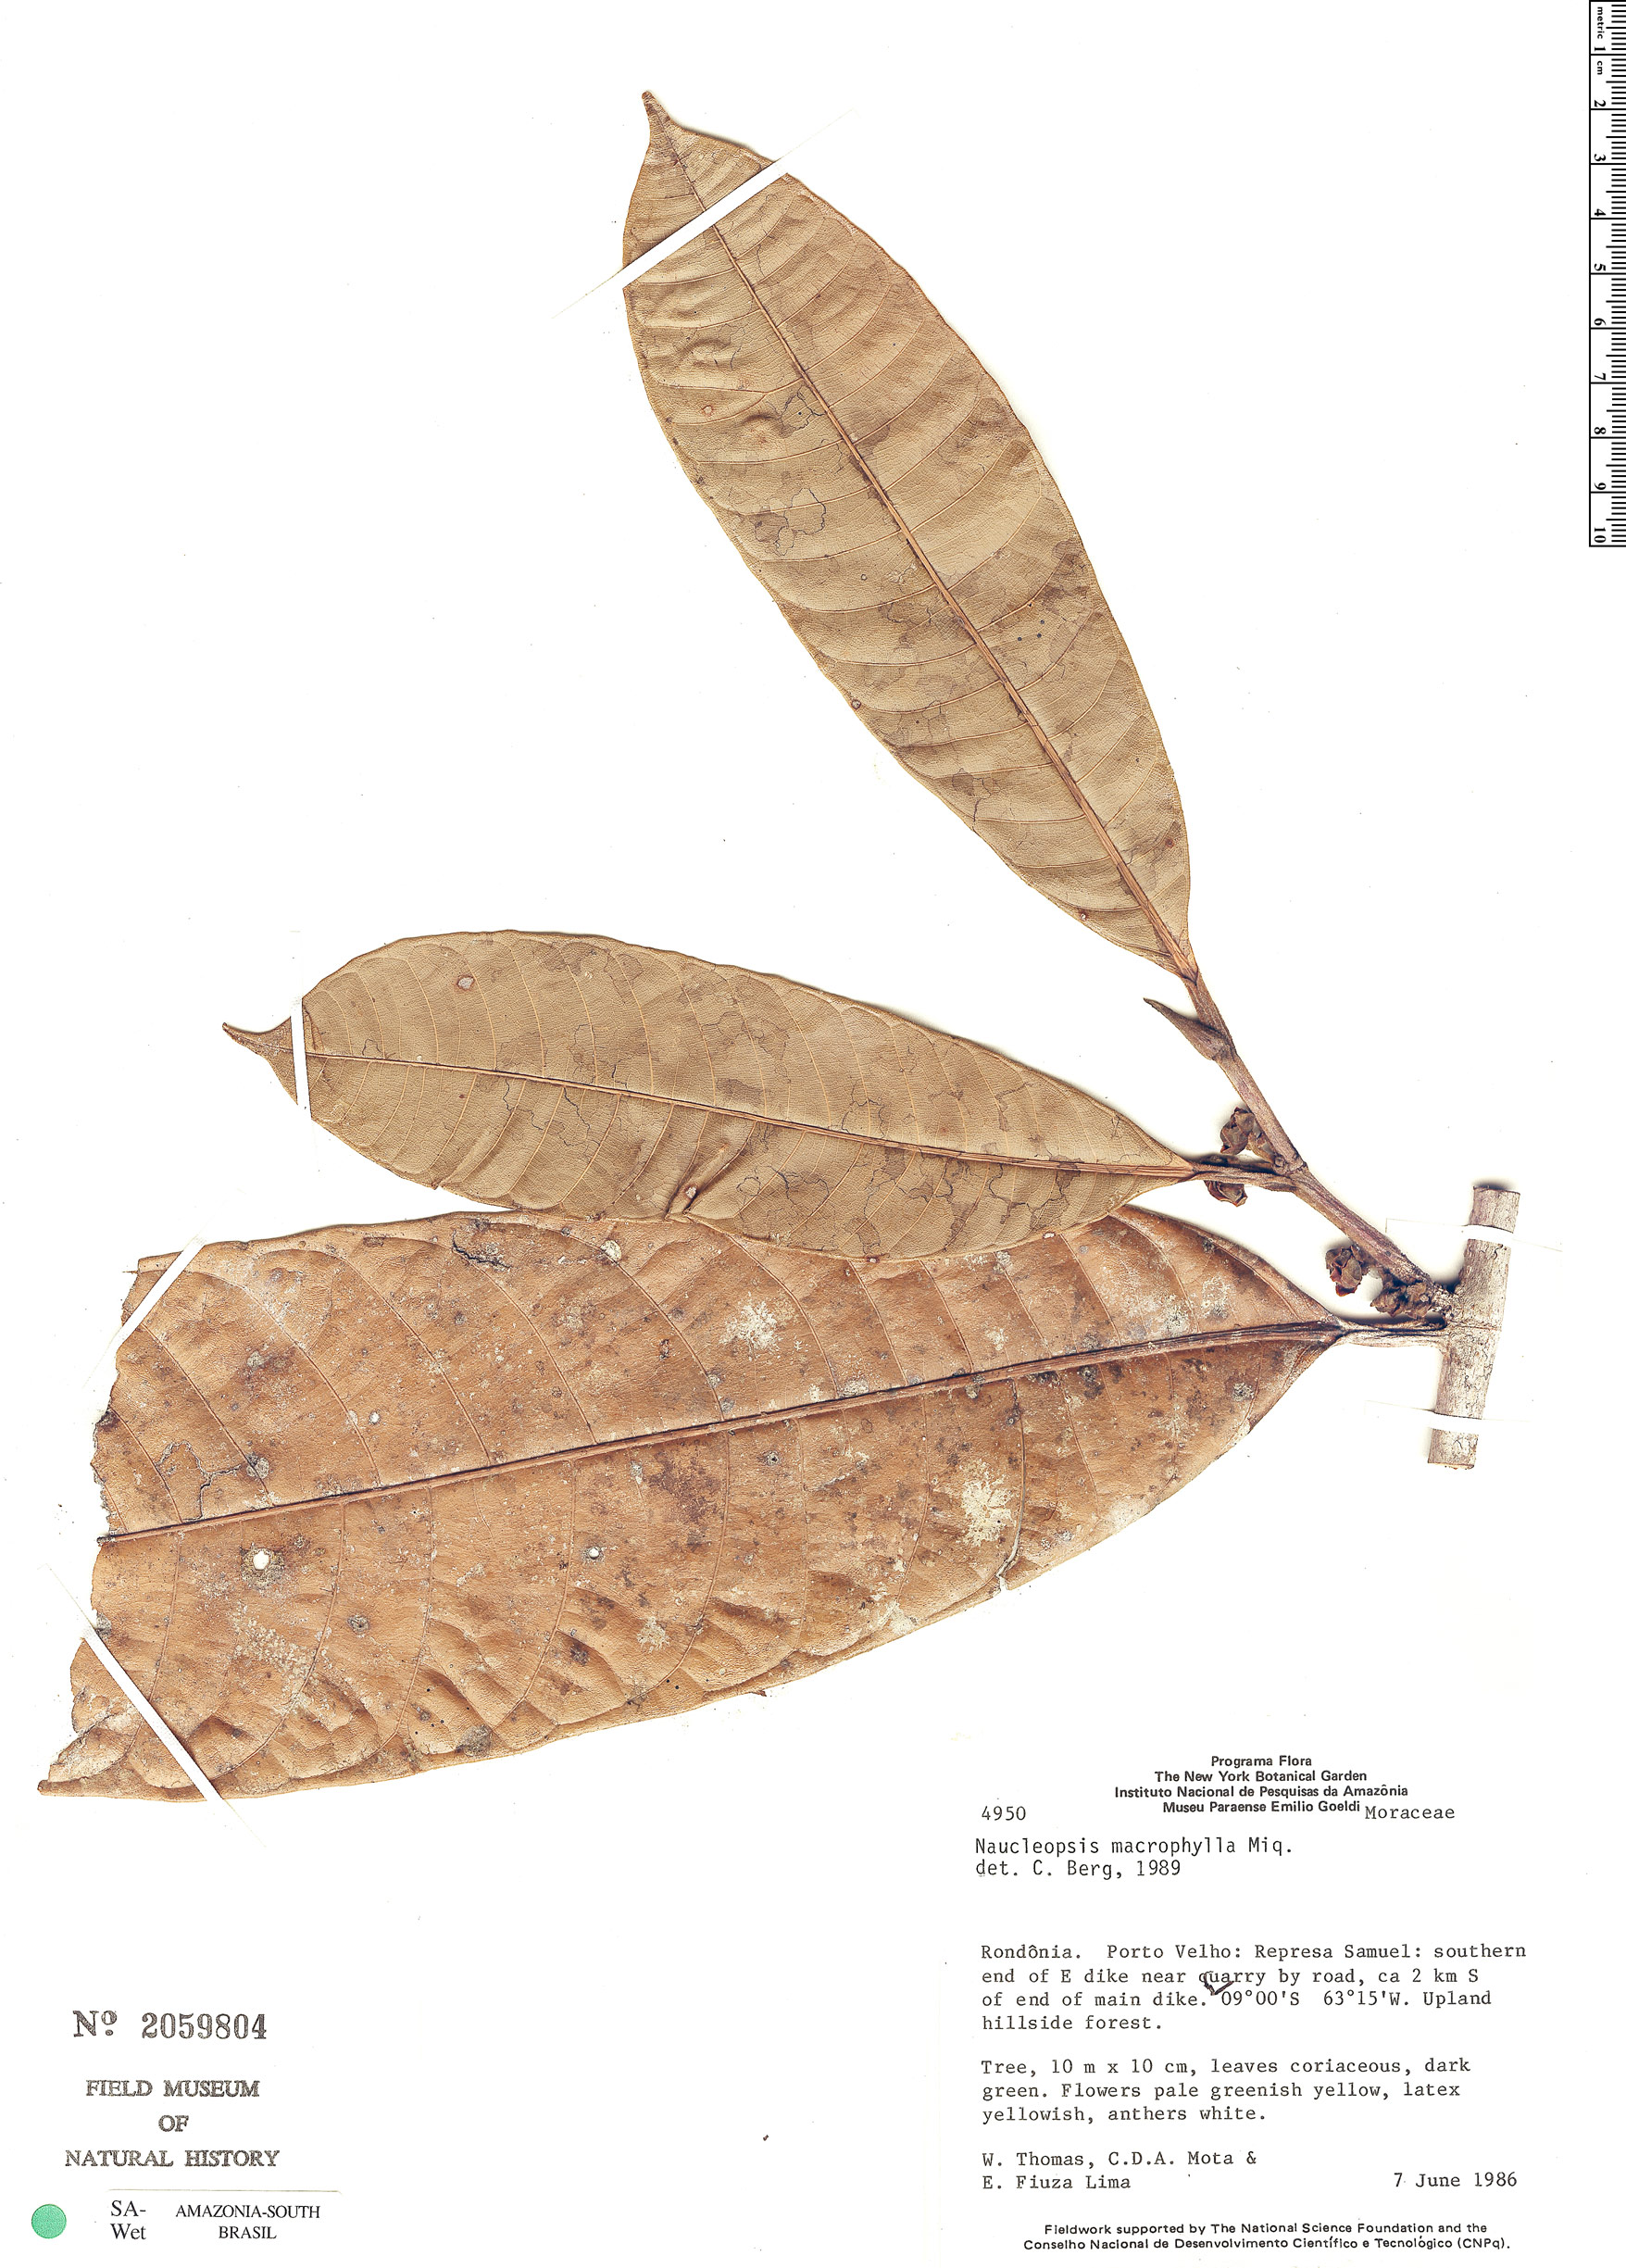 Specimen: Naucleopsis macrophylla